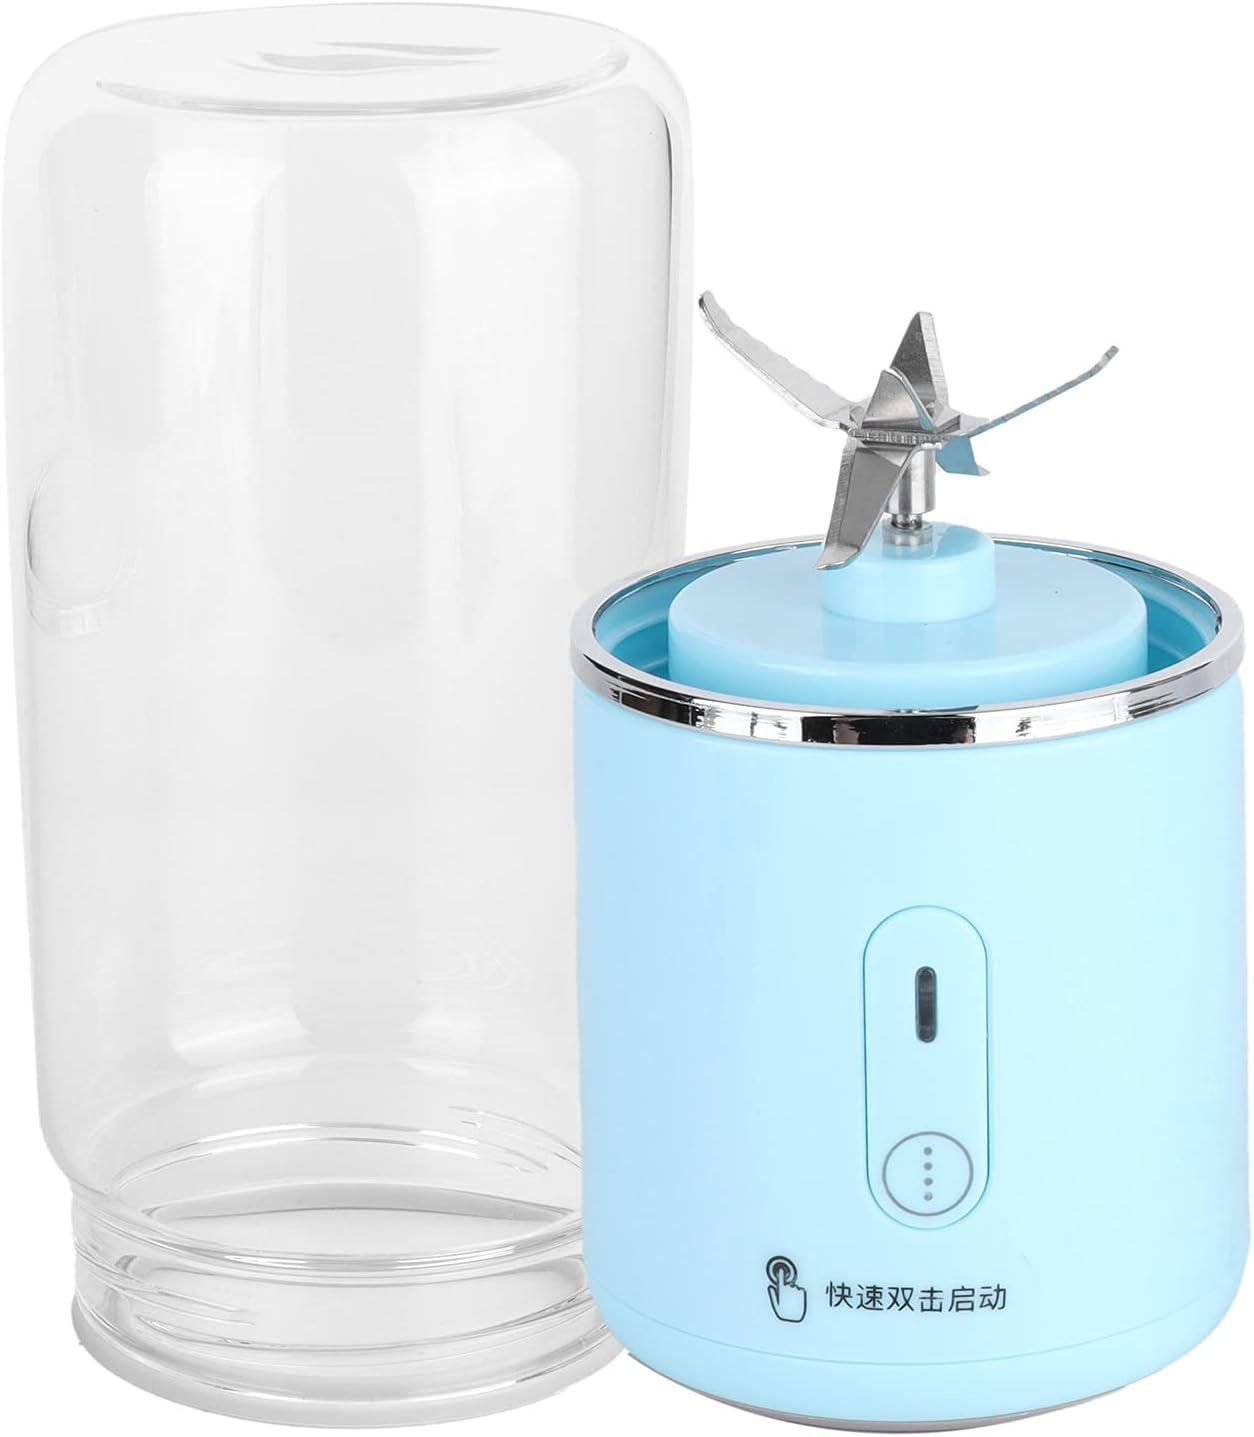 Aoca Licuadora portátil de 300 ml para Suministros de Viaje en casa, licuadora de Viaje Recargable Azul, máquina mezcladora, batidora de Frutas, batidora de Leche